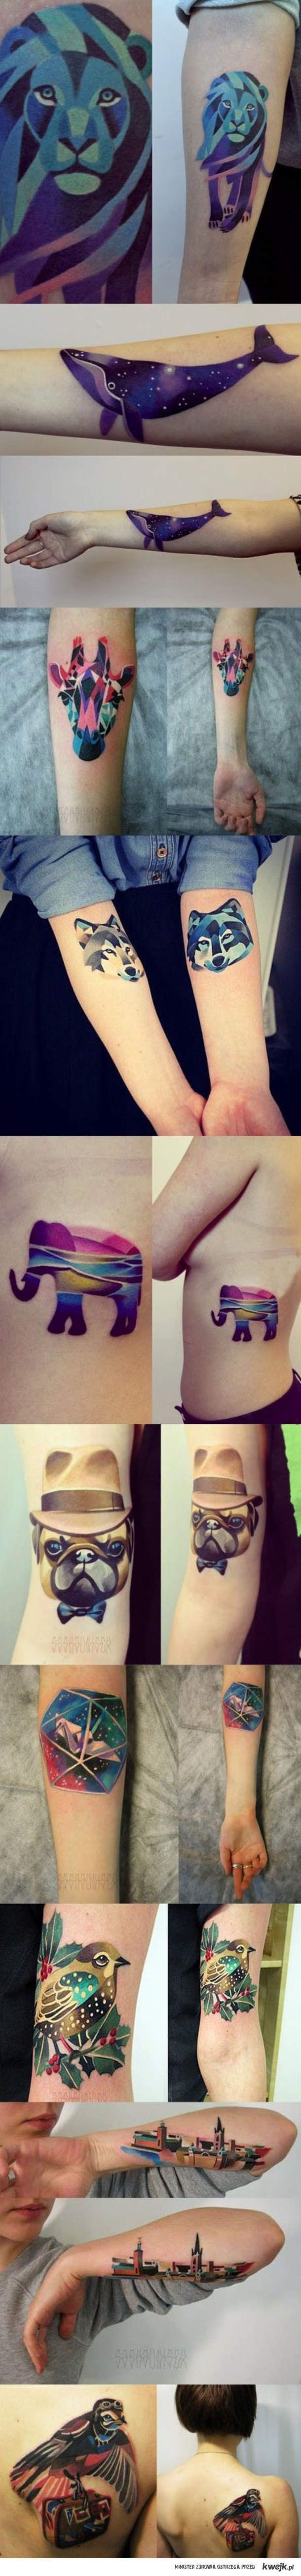 really cool geometric tattoos. Artist - Sasha Unisex. Follow her art on Instagram!